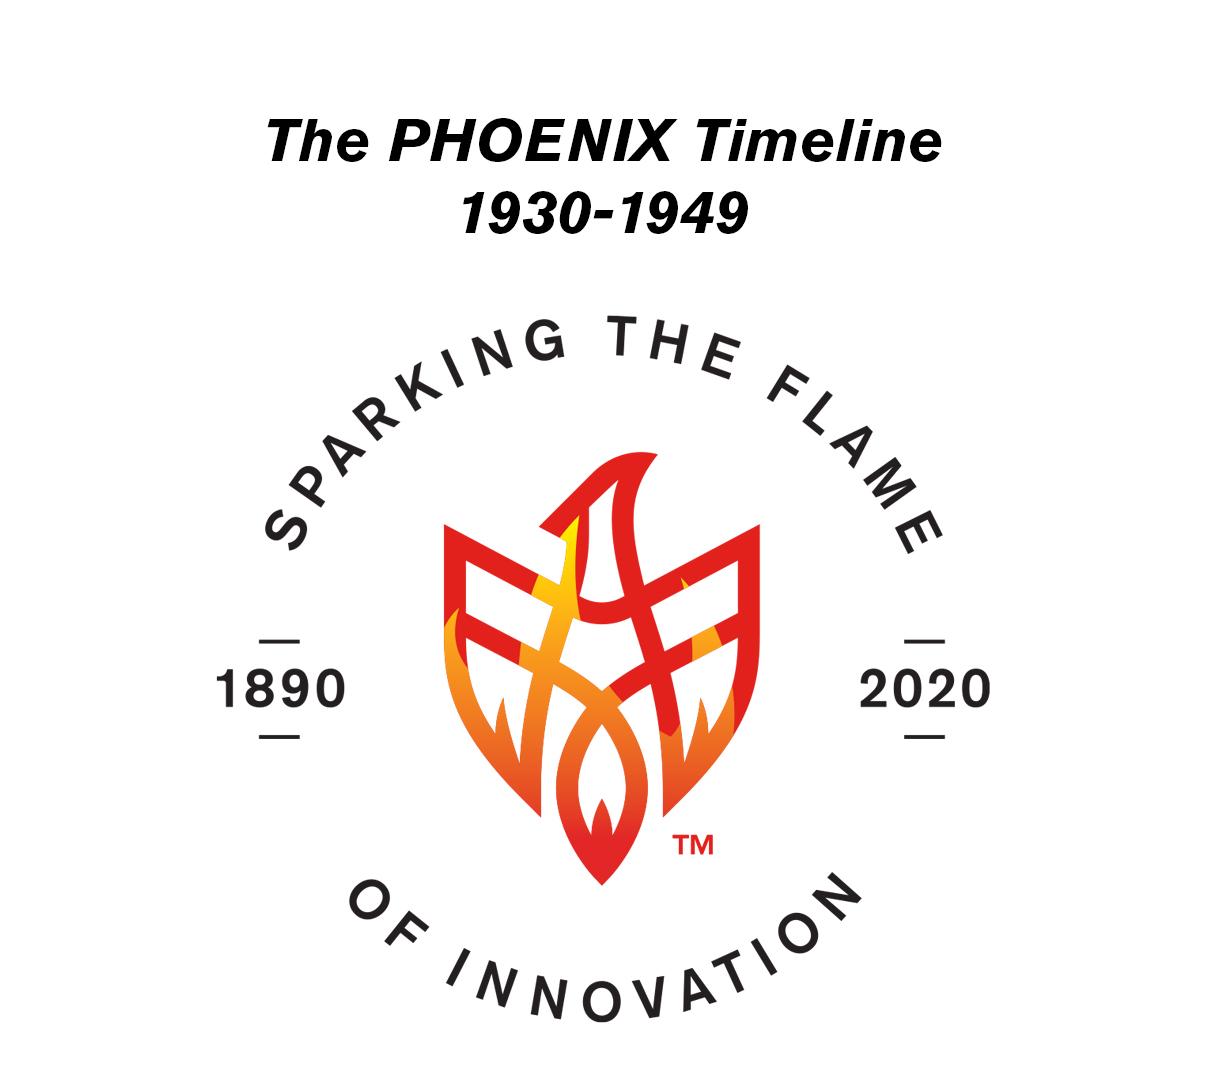 PHOENIX celebrates 130 years: 1930-1949 Timeline